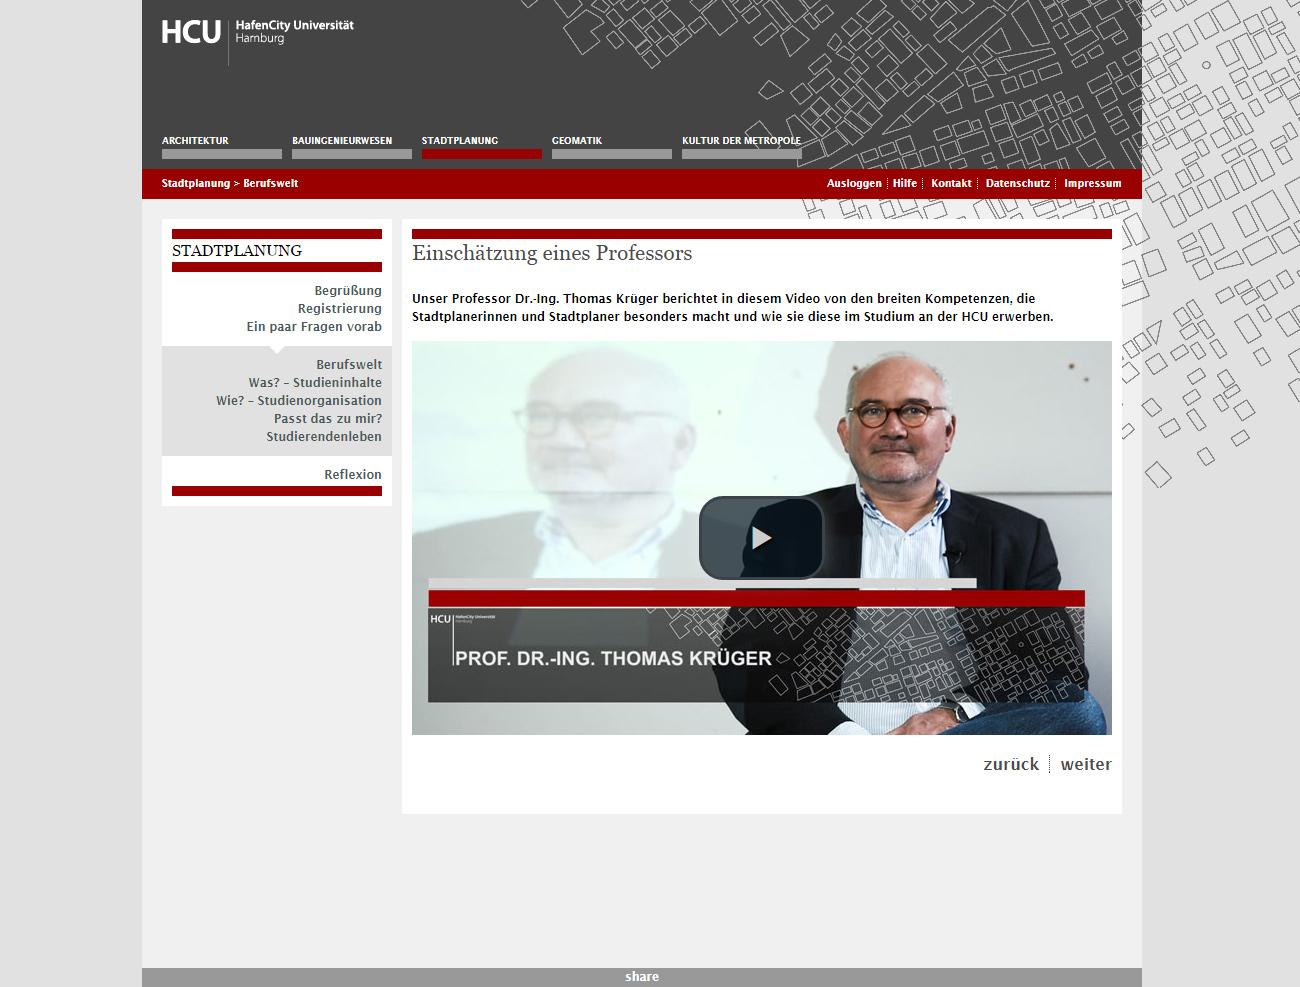 03_Berufswelt_Video_Prof